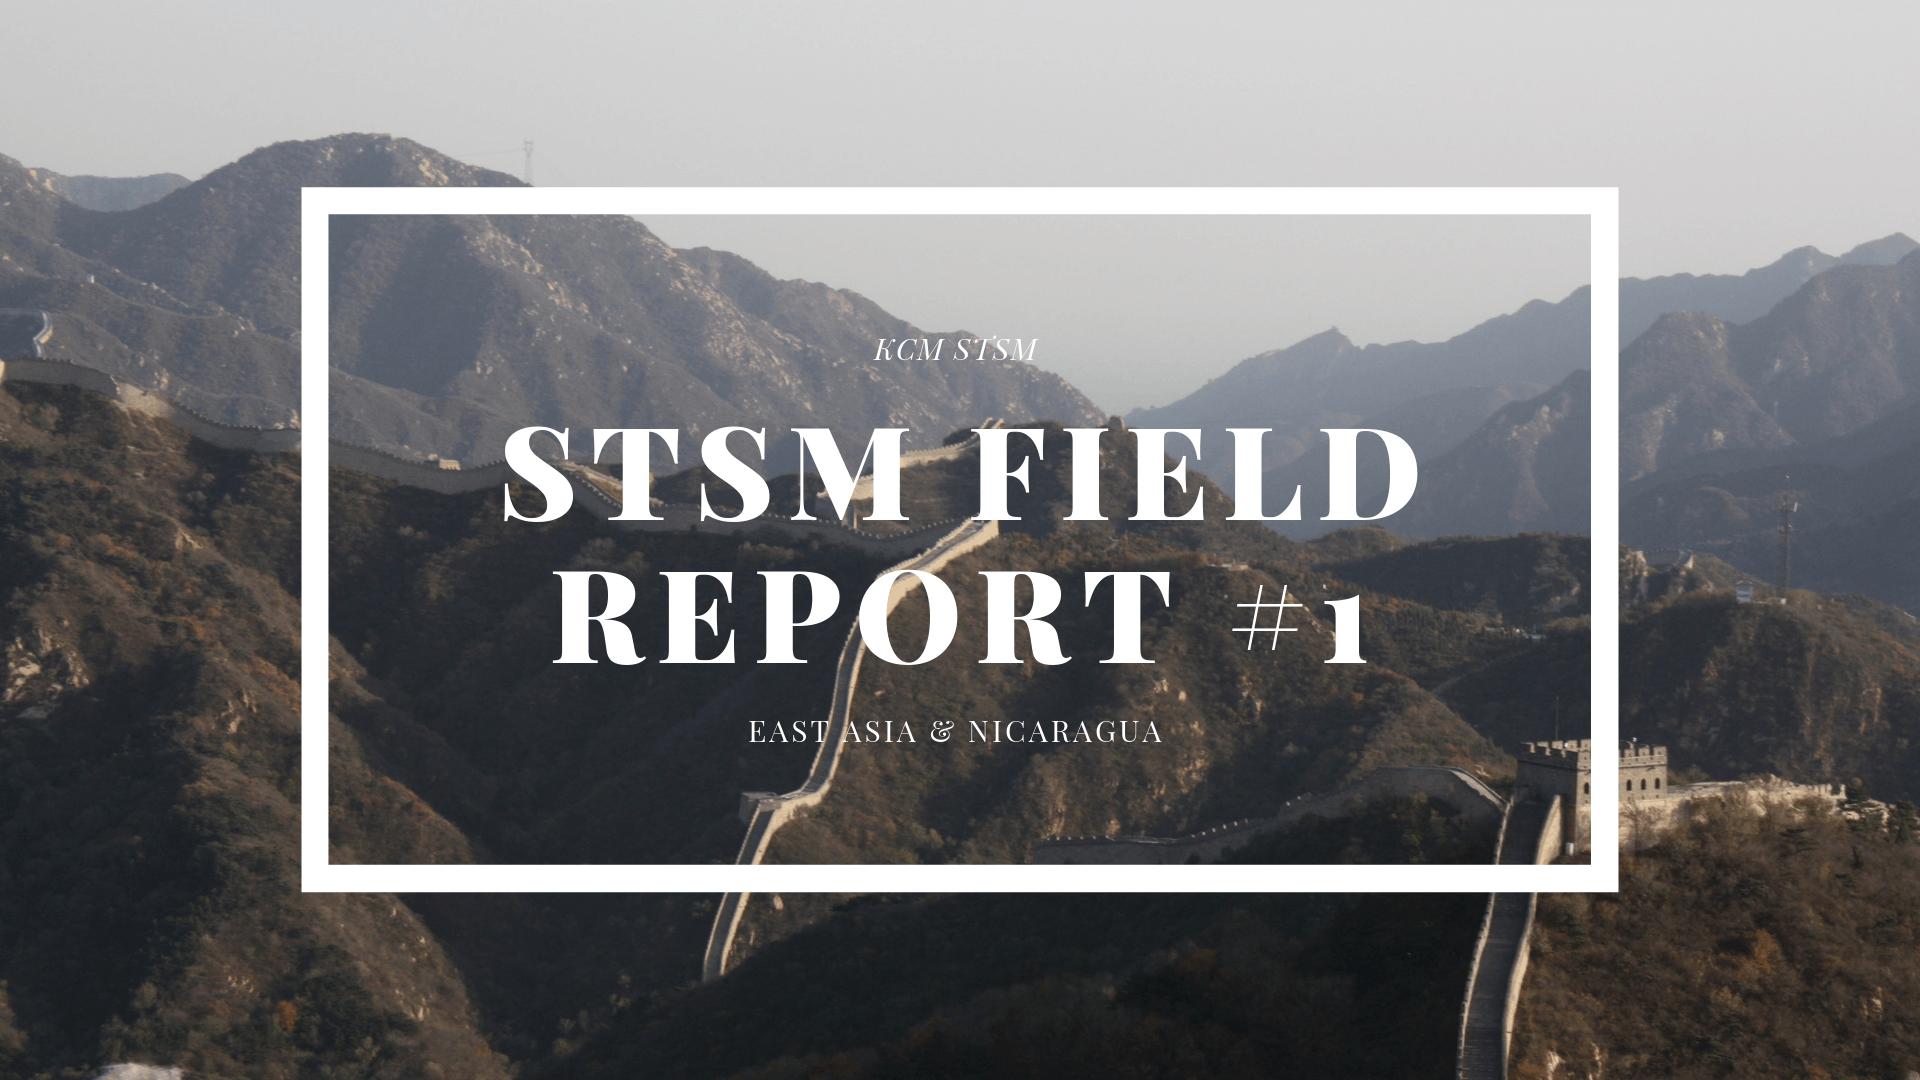 STSM Field Report – East Asia & Nicaragua #1